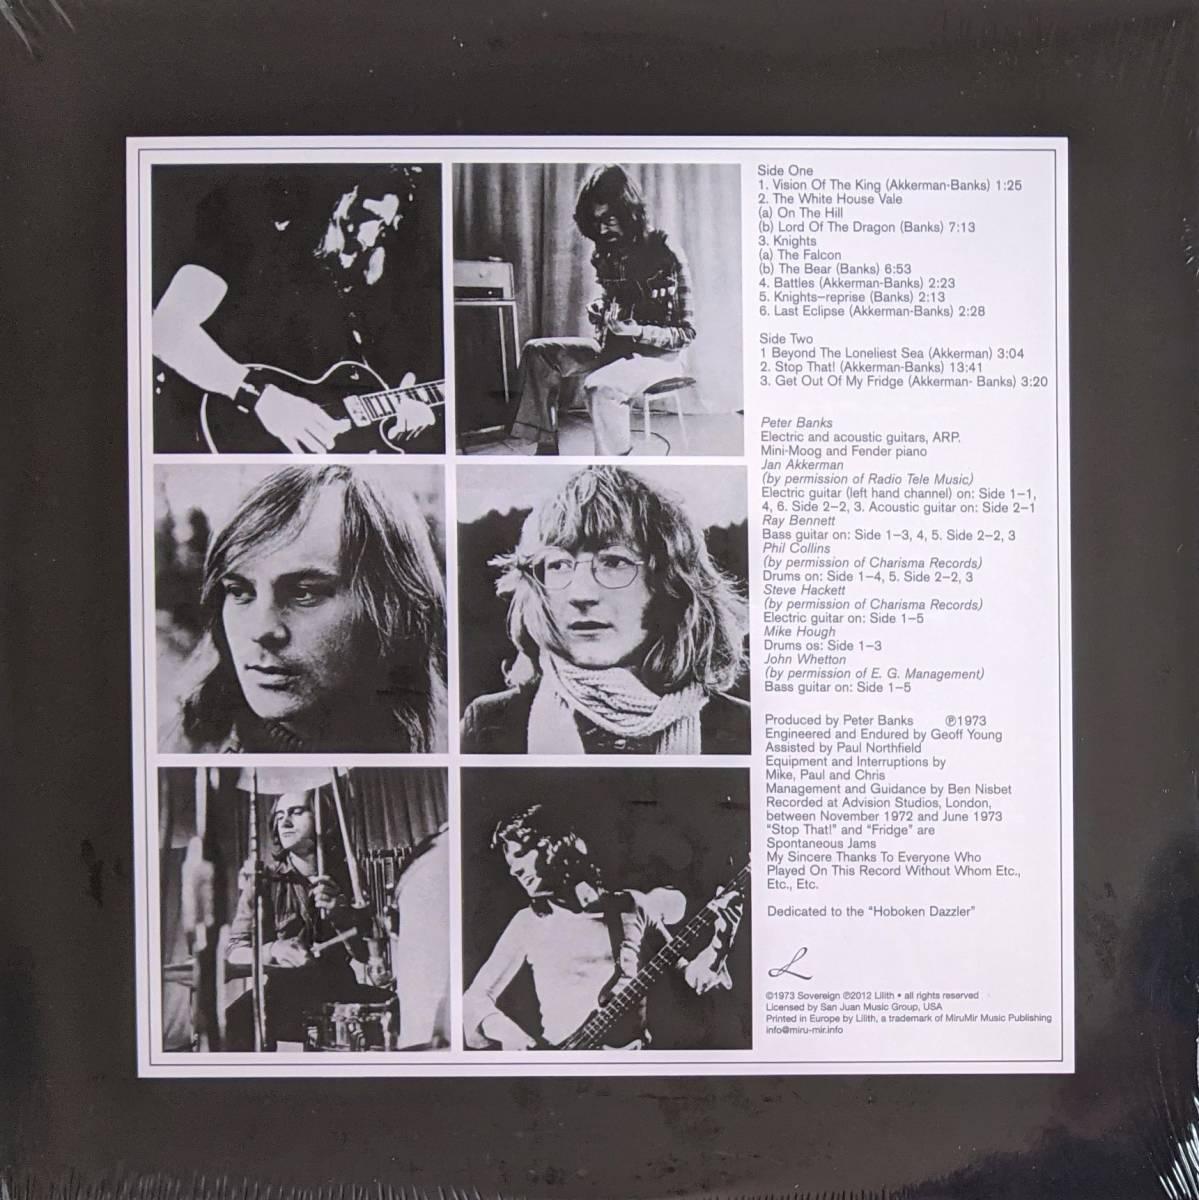 Peter Banks ピーター・バンクス (Original Member of Yes, Flash) - Two Sides Of Peter Banks CD(同内容)付限定再発アナログ・レコード